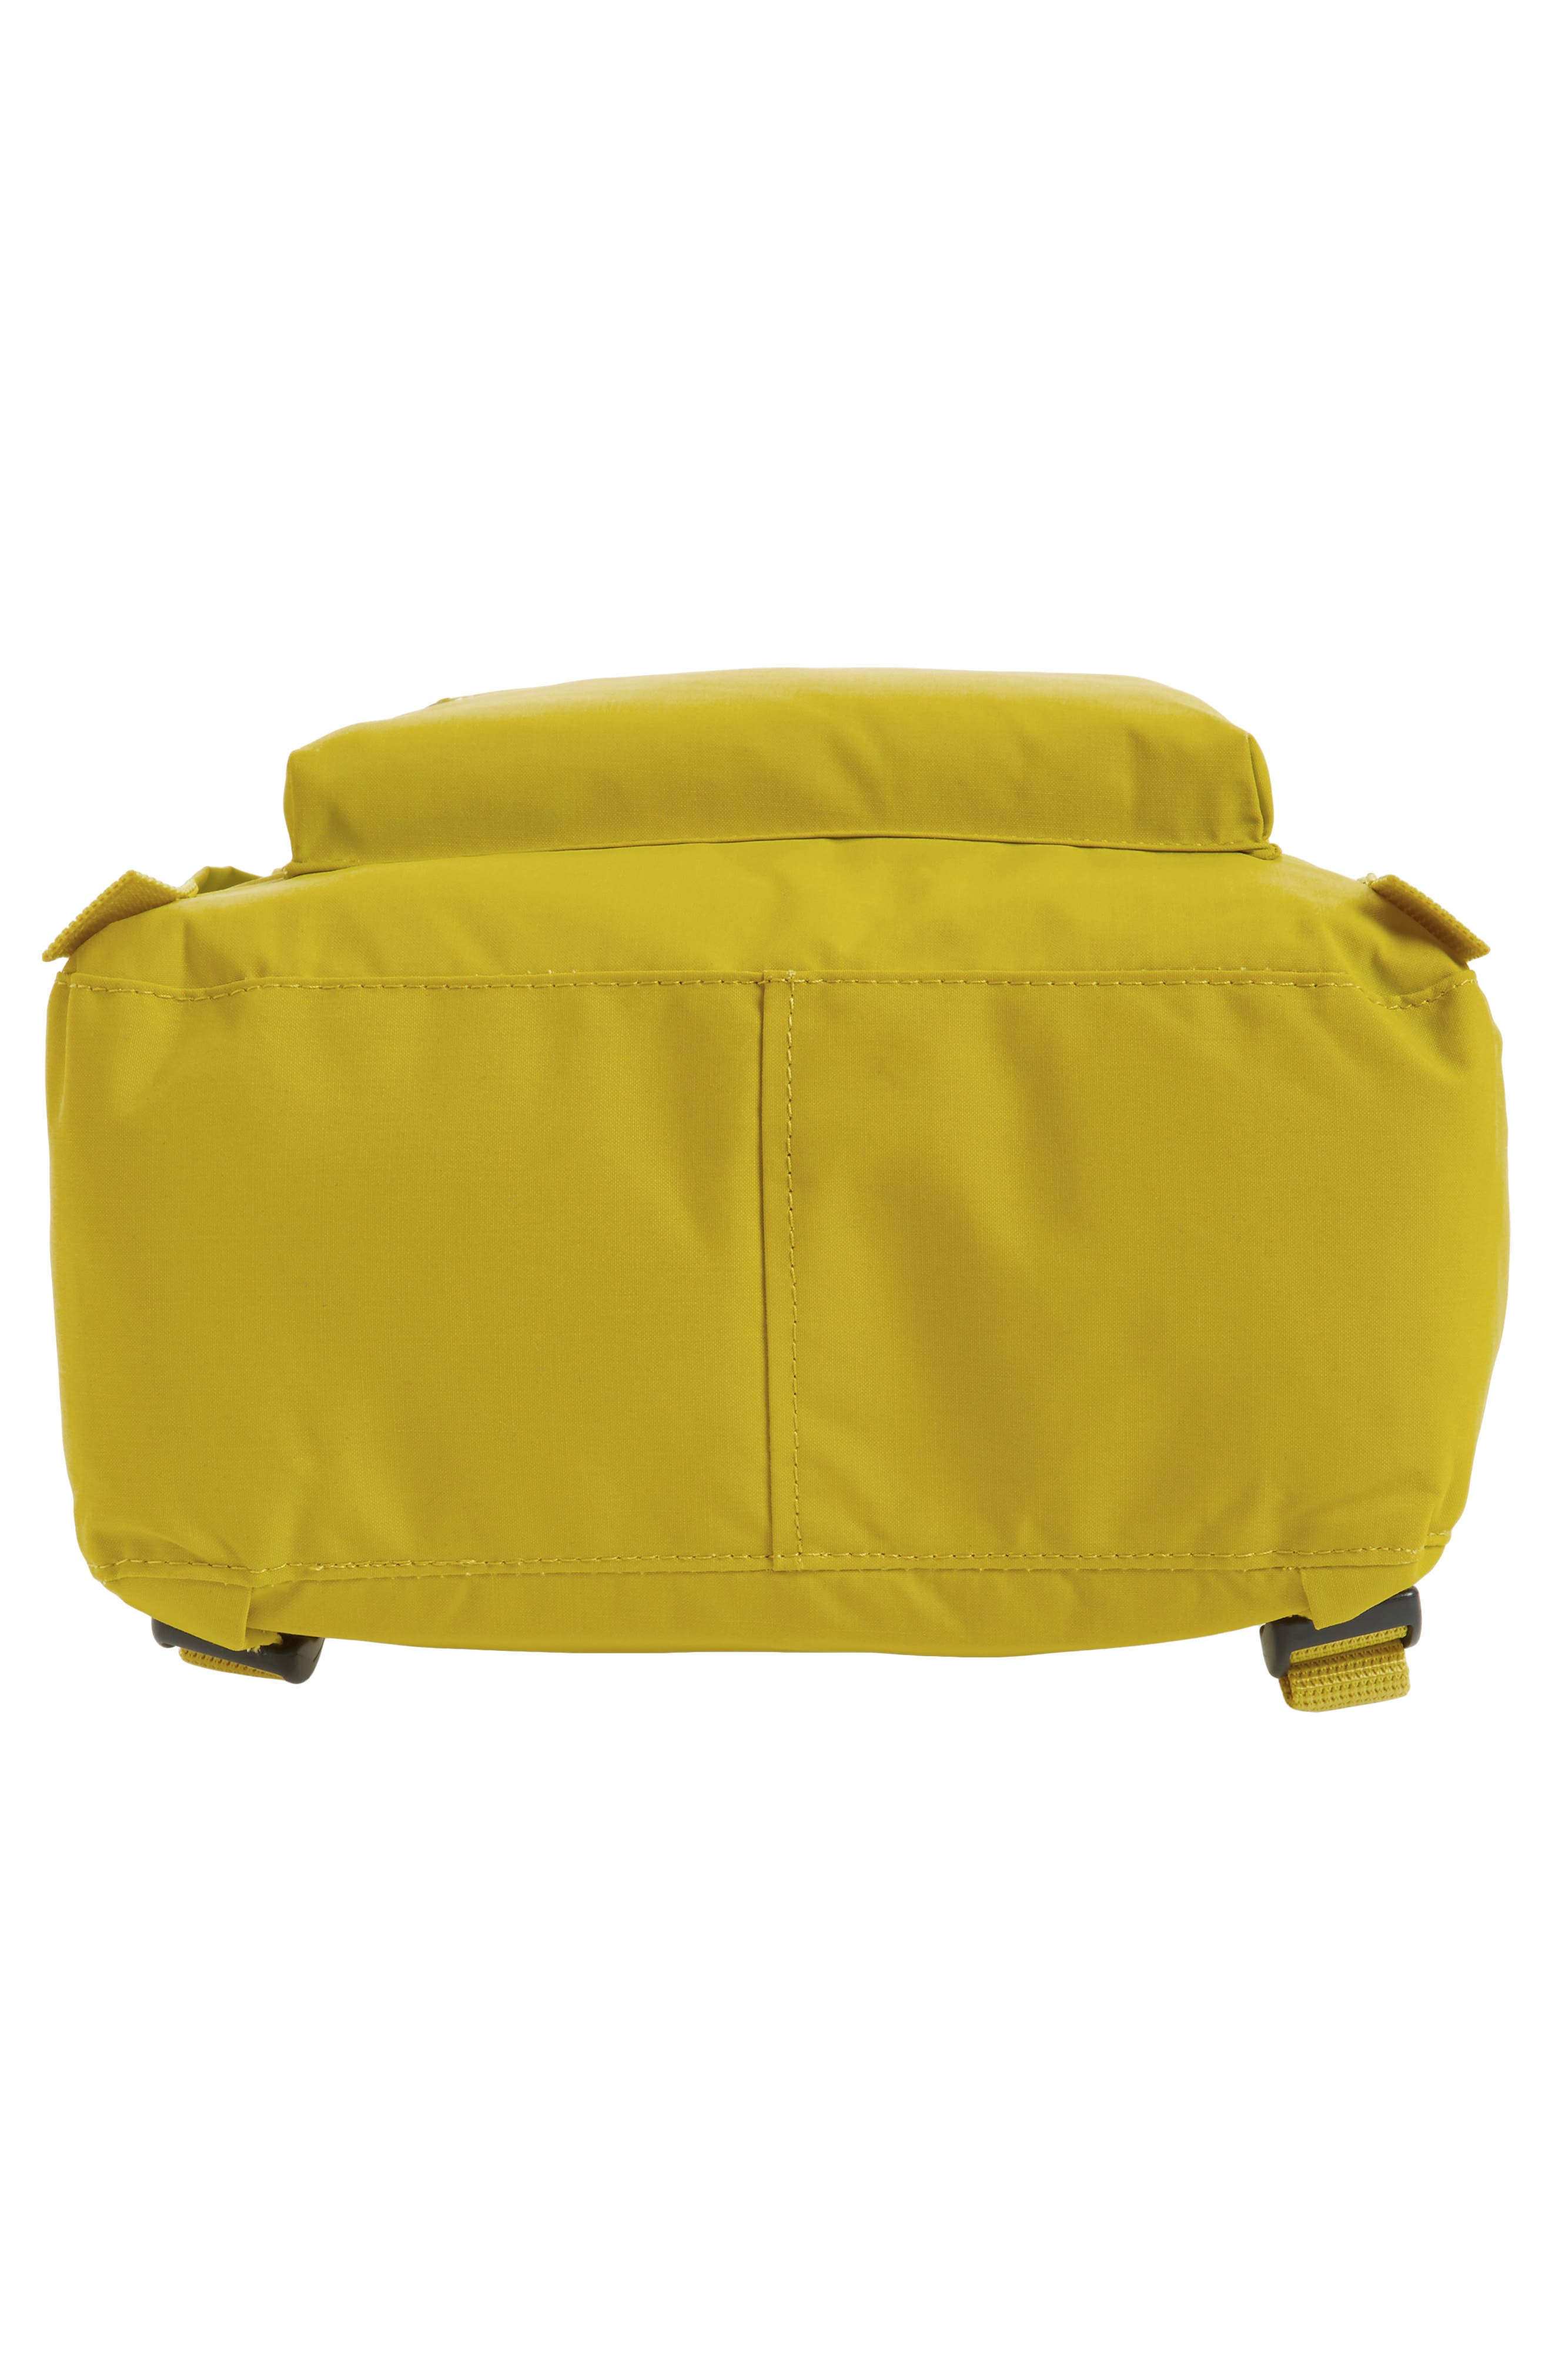 'Kånken' Water Resistant Backpack,                             Alternate thumbnail 327, color,